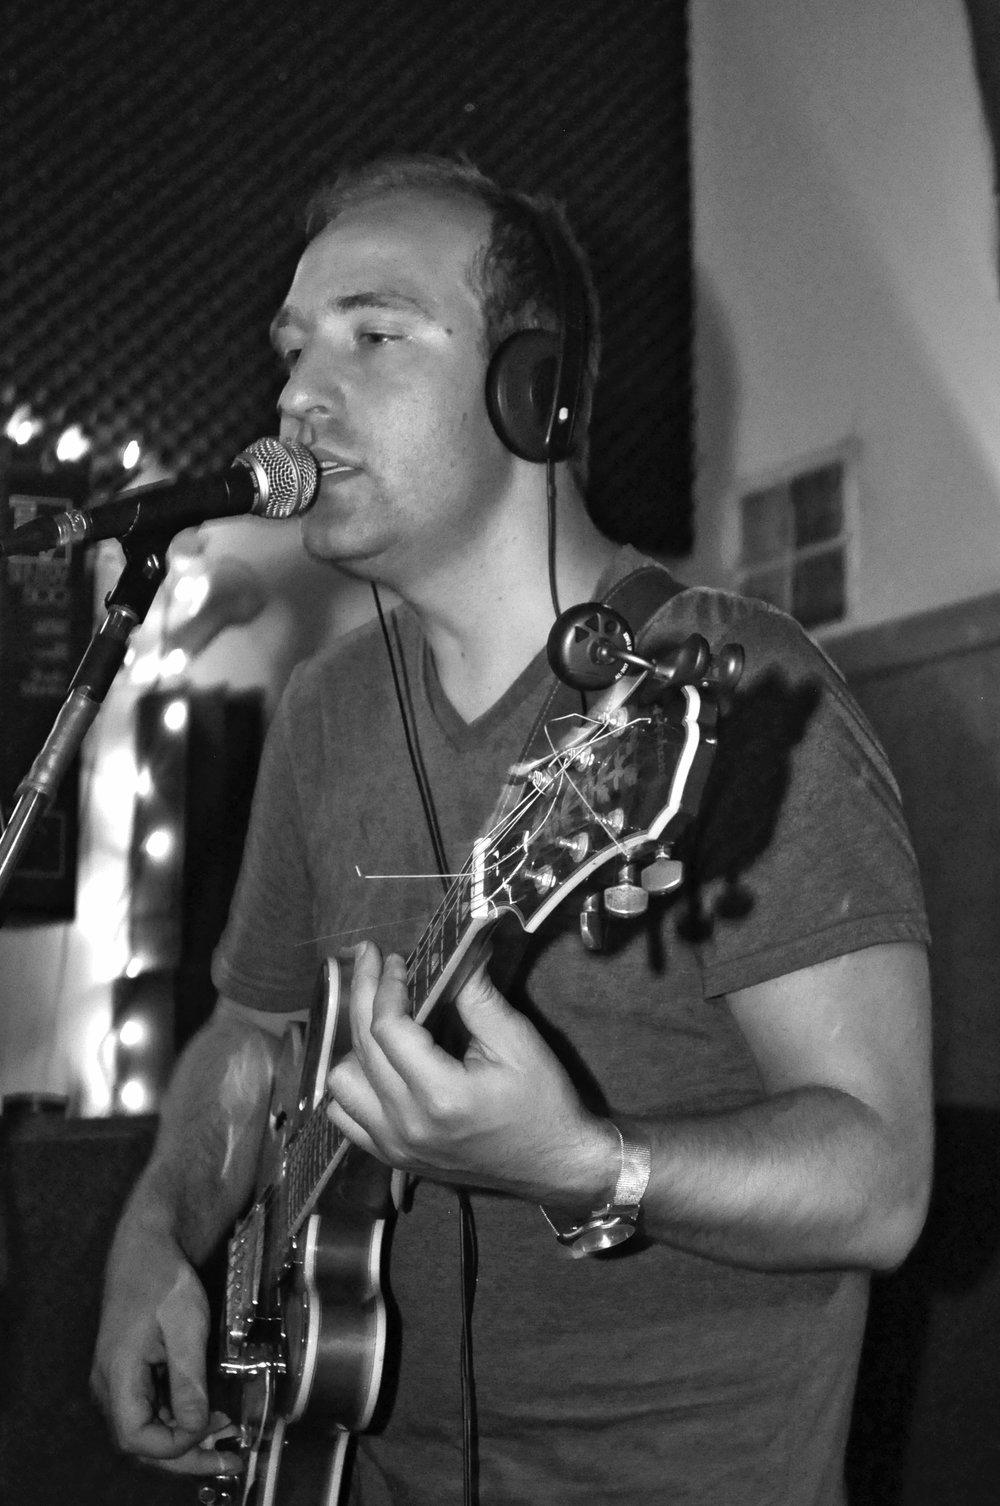 NICO JANSSEN - Vocals, Guitar